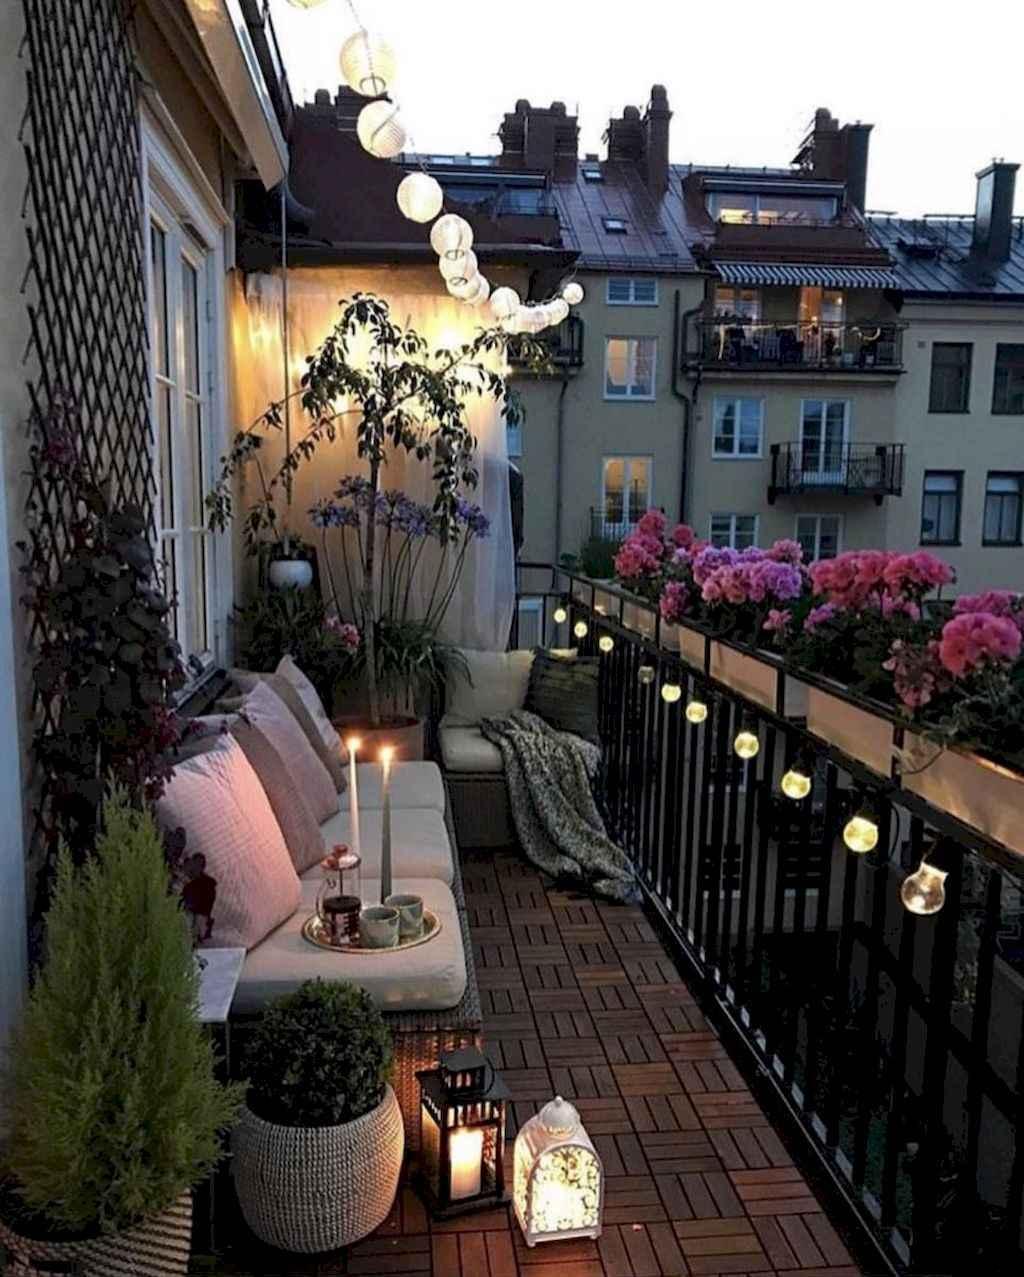 Decorating Apartment Ideas Apartment: 65 Cozy Apartment Balcony Decorating Ideas